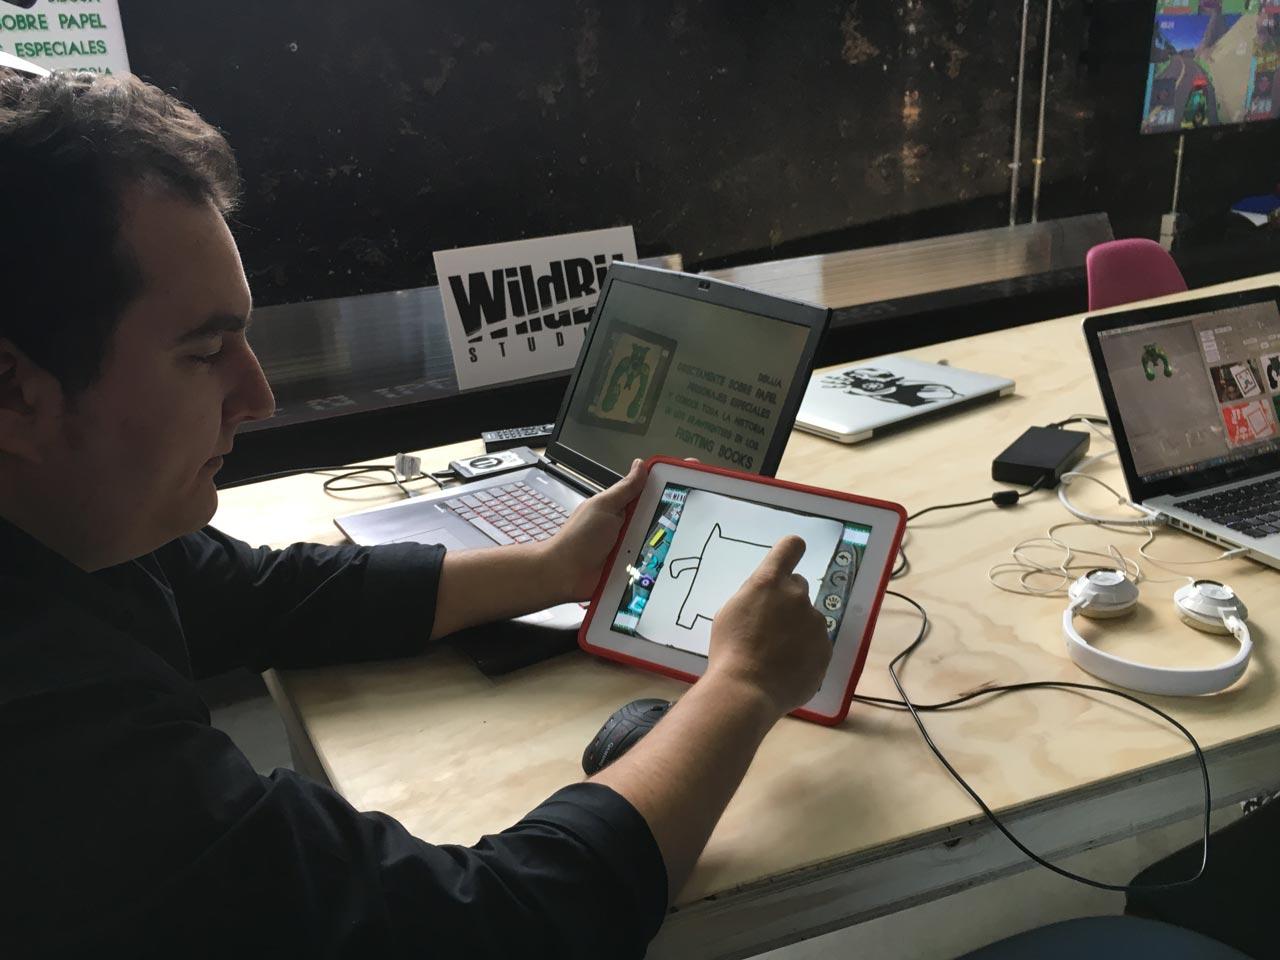 Entrevista a Wildbit Studios